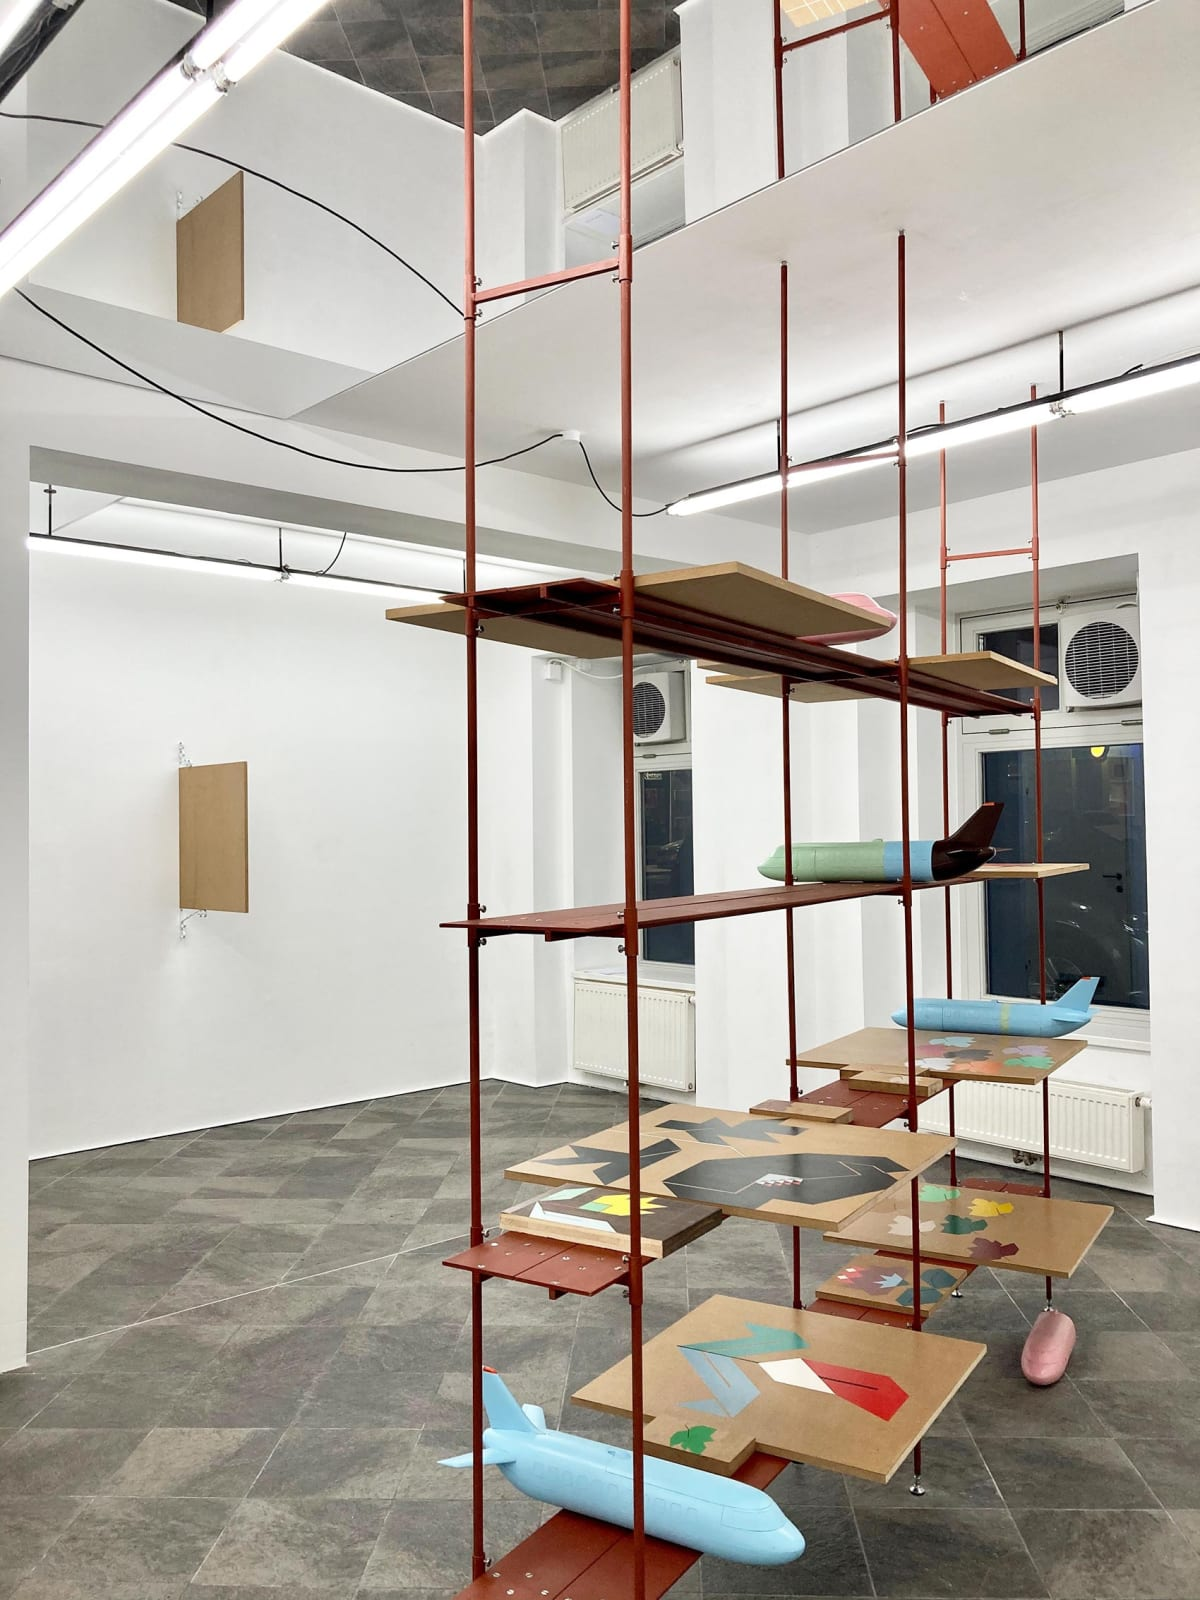 image shows shelves with artwork from the artist Siggi Hofer.